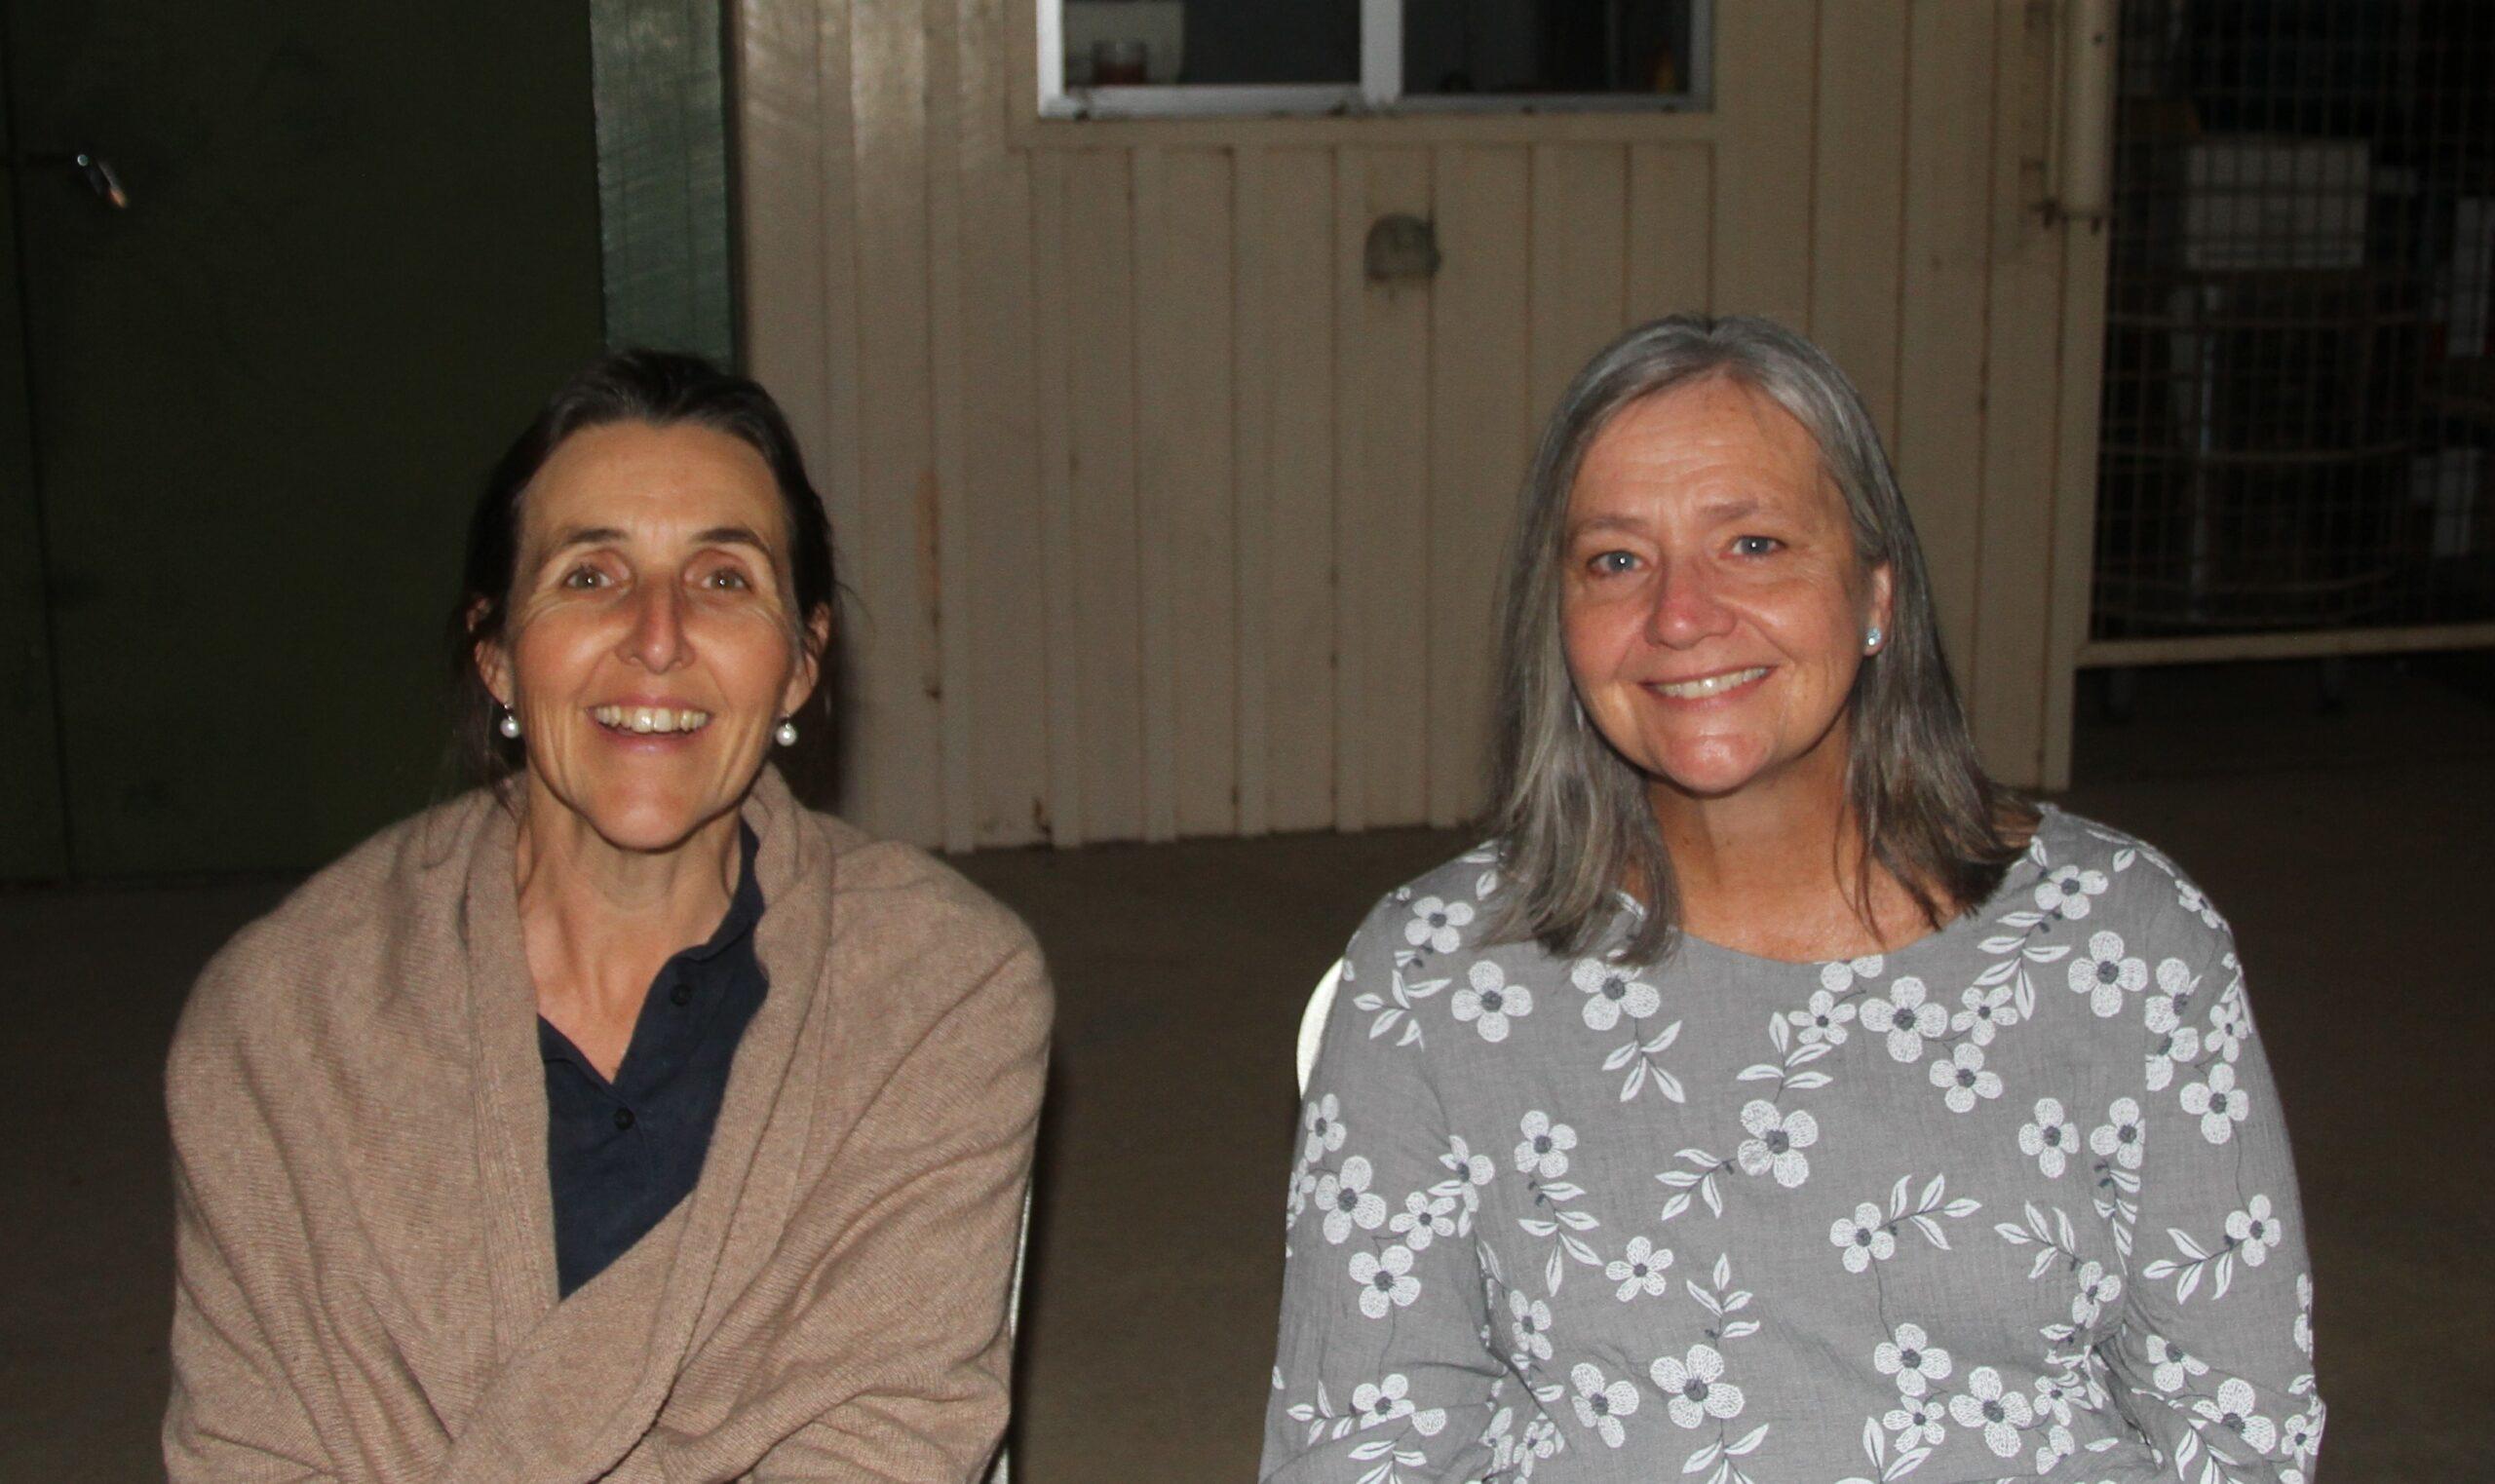 Narrabri Art & Craft Society secretary Kaylene McClenaghan with Louise Stiller.